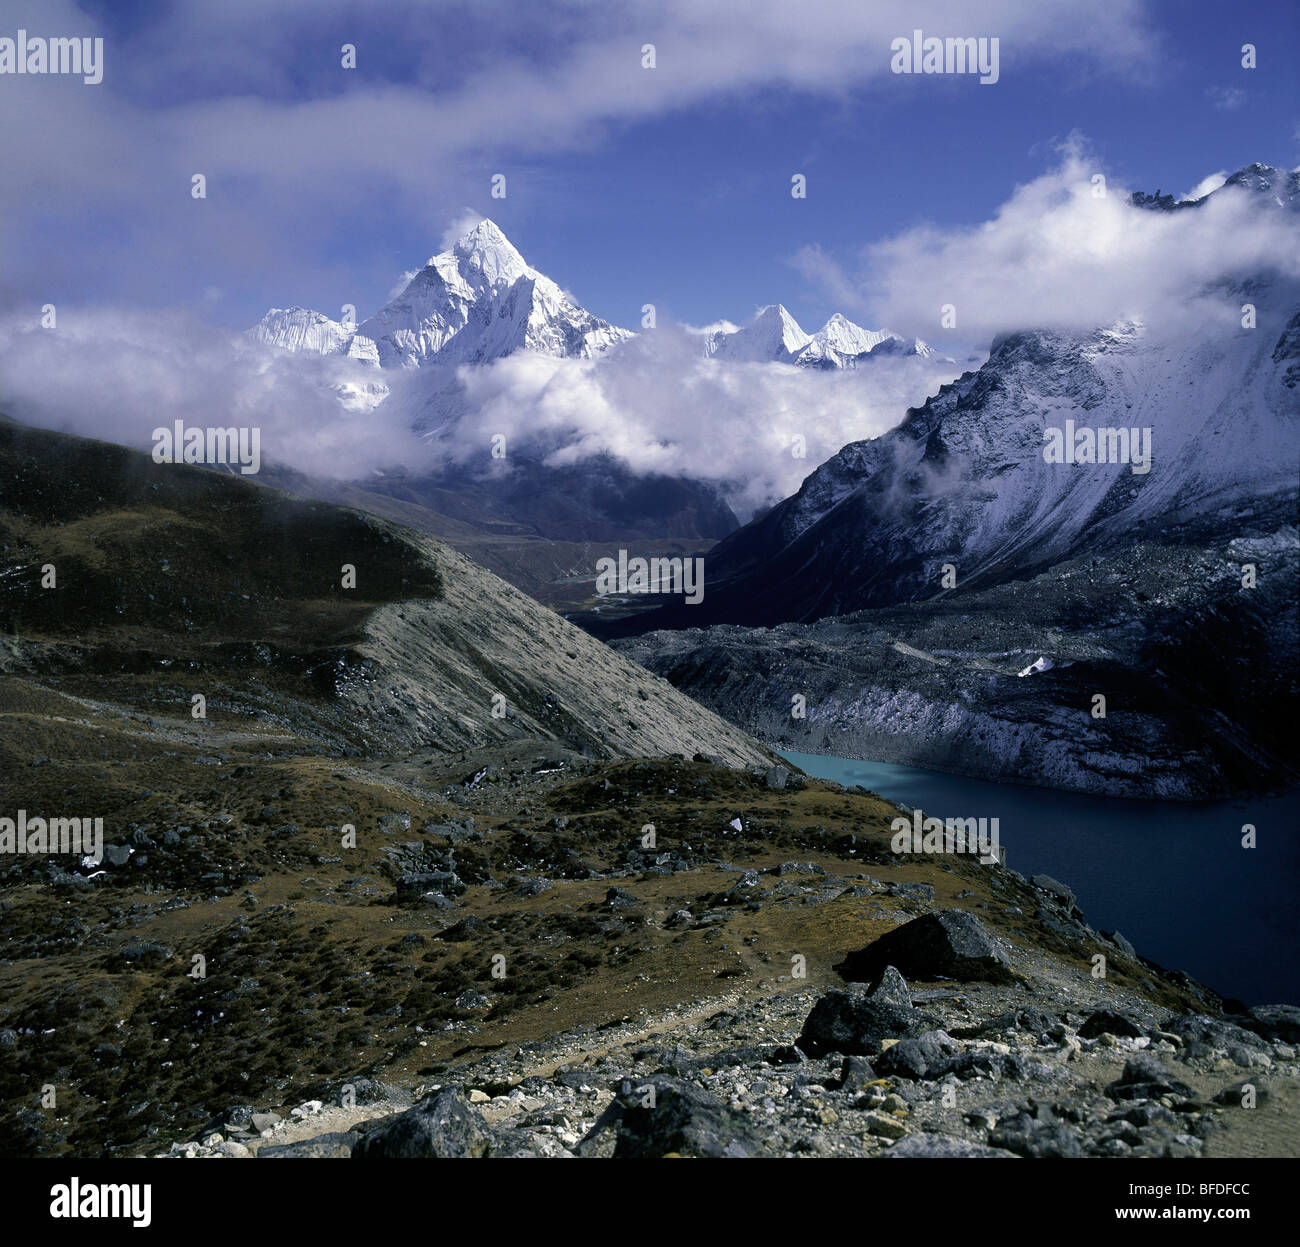 Lhotse himal - Stock Image